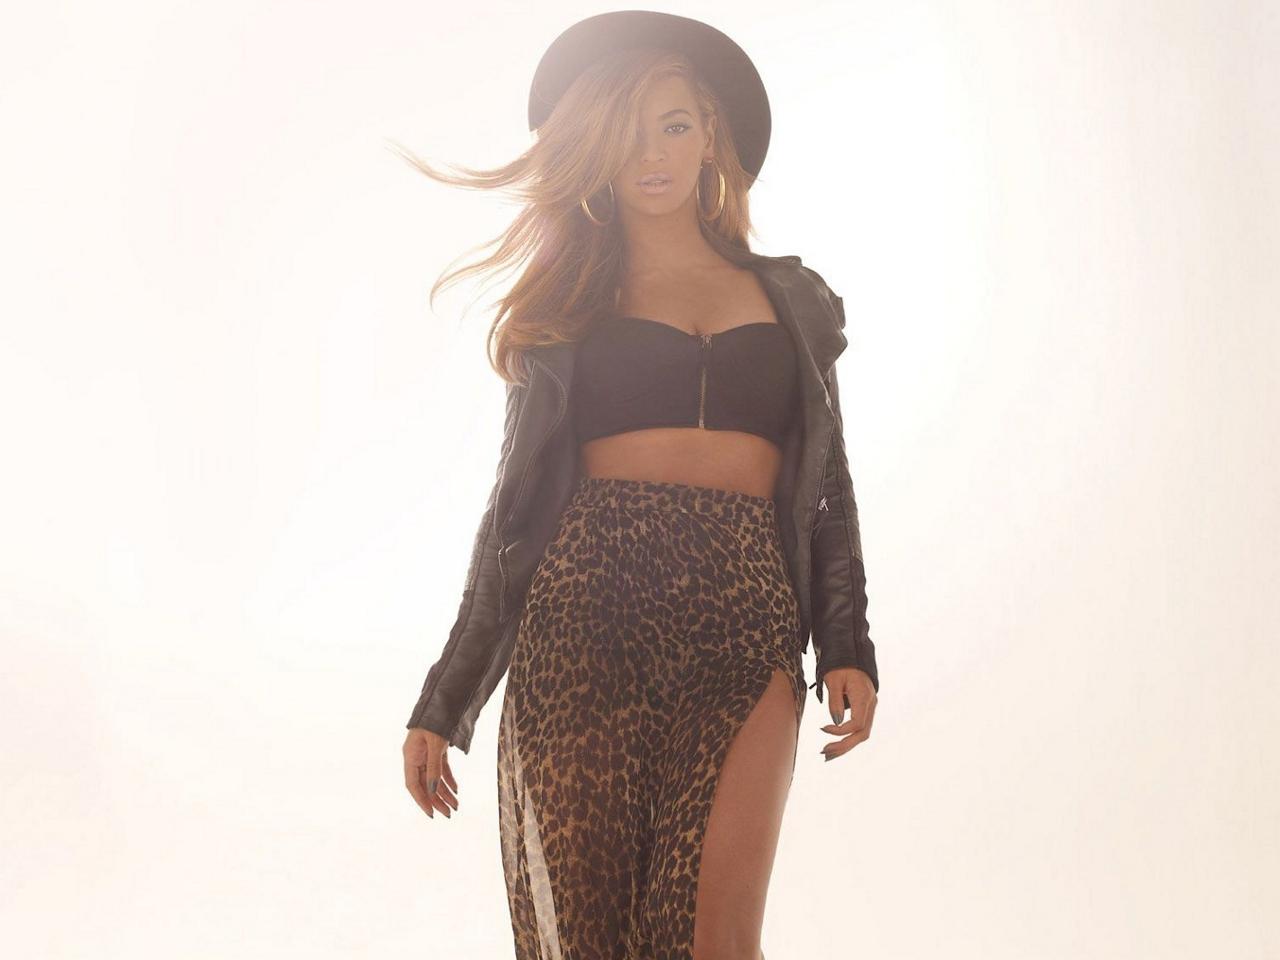 Beyonce Dereon 2012